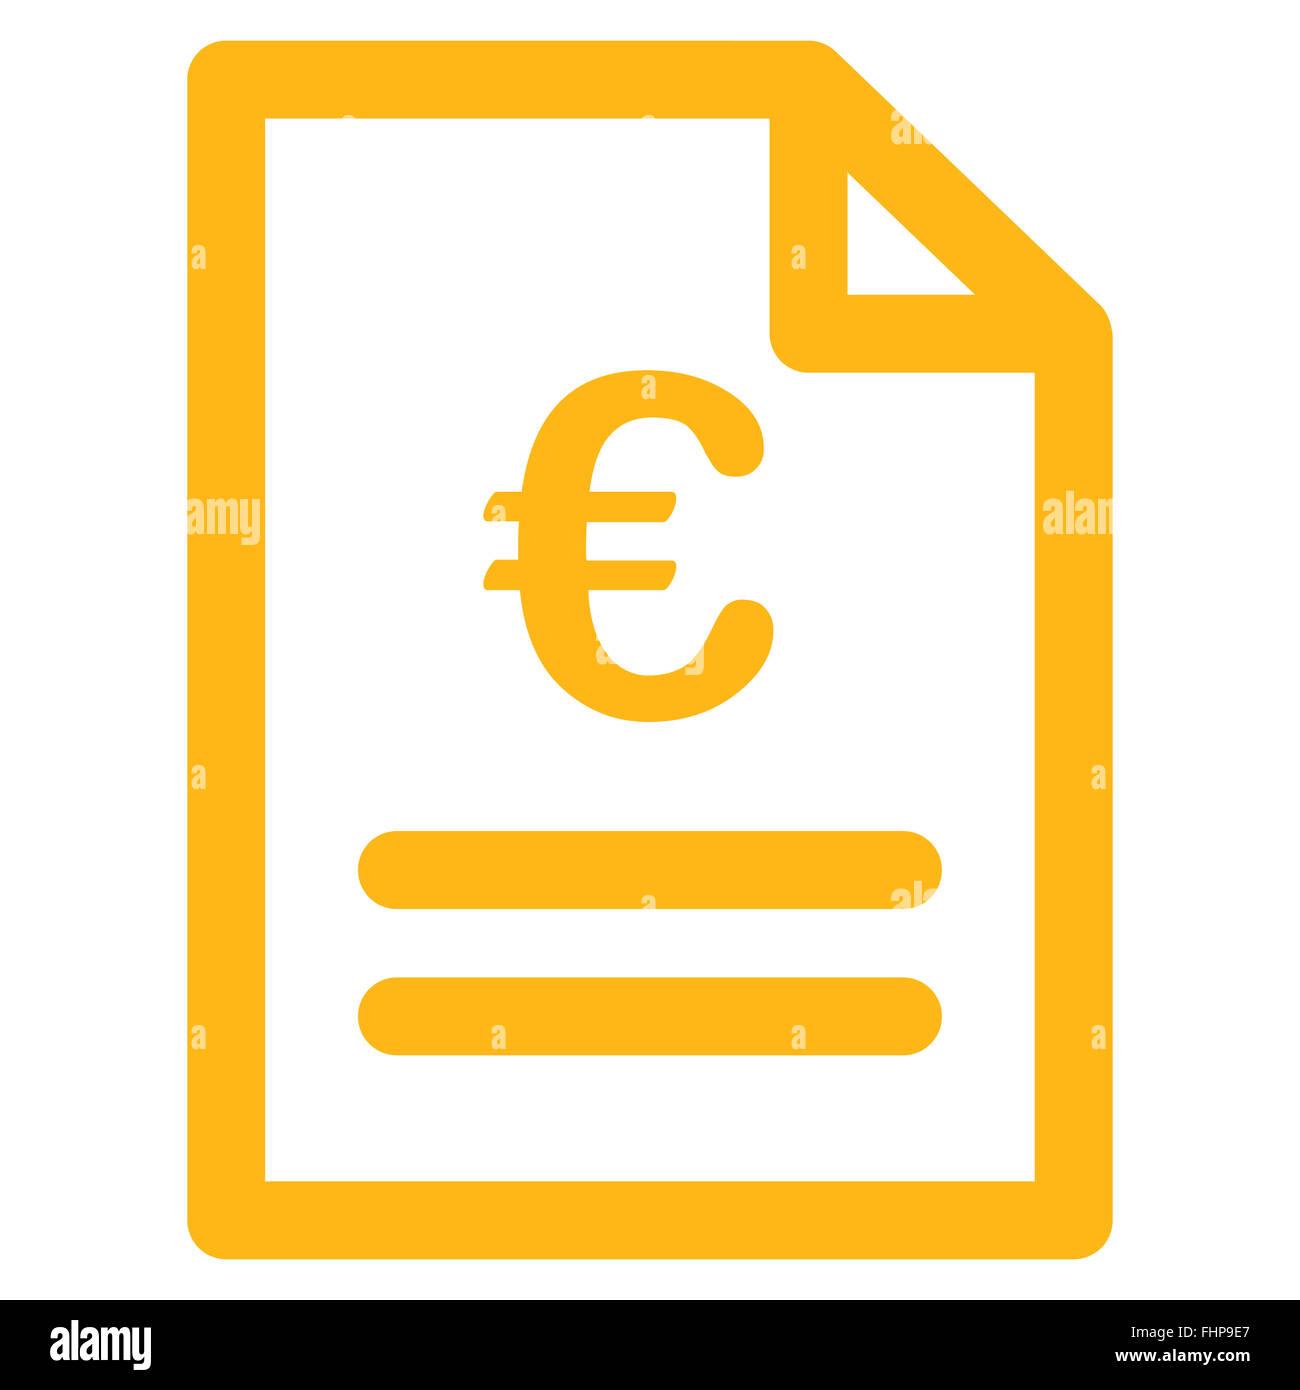 Euro-Rechnung-Symbol Stockfoto, Bild: 96991391 - Alamy